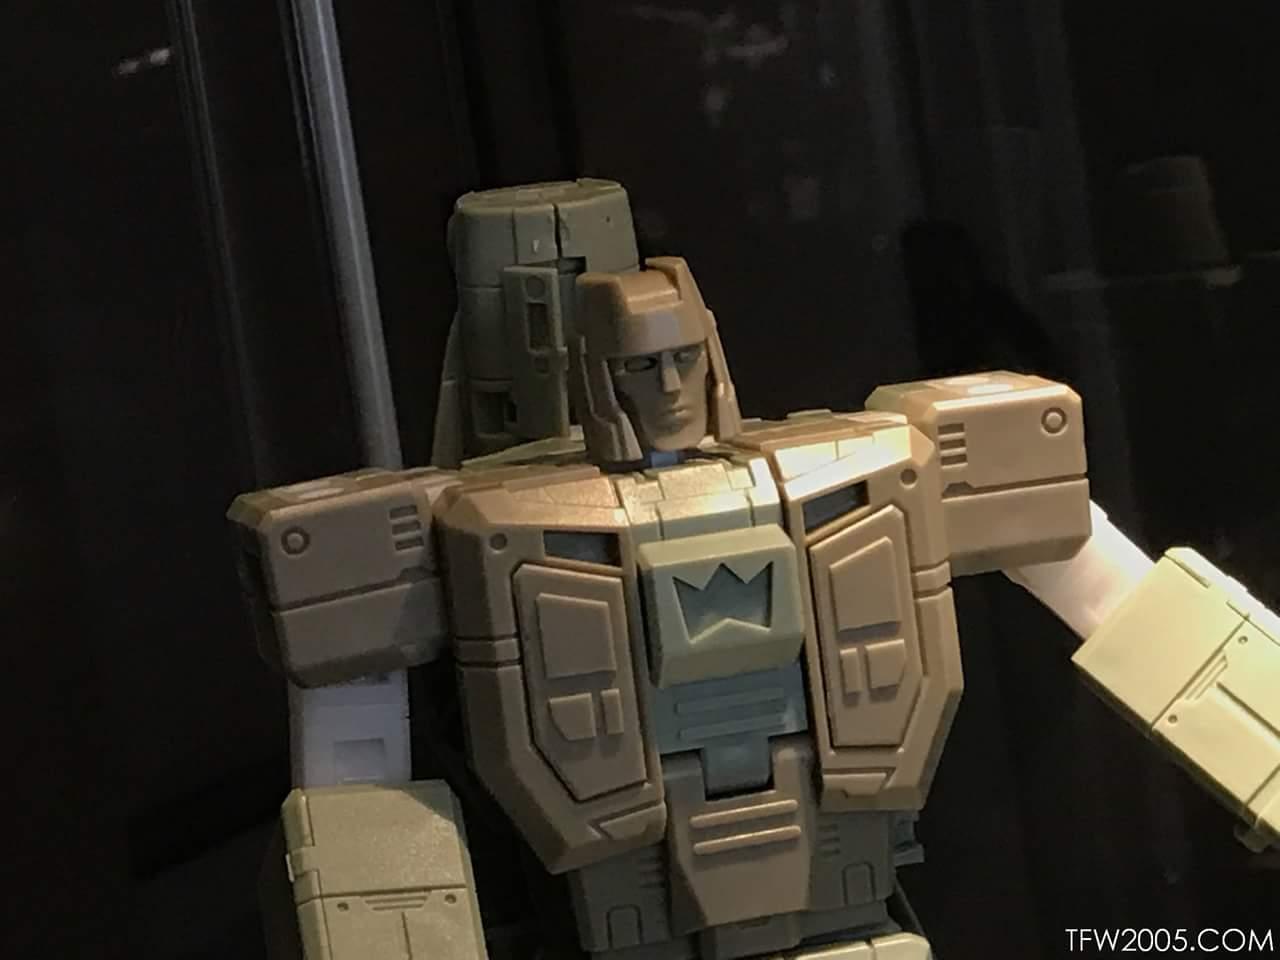 [Zeta Toys] Produit Tiers ― Kronos (ZB-01 à ZB-05) ― ZB-06|ZB-07 Superitron ― aka Superion - Page 2 ASk0EDkM_o